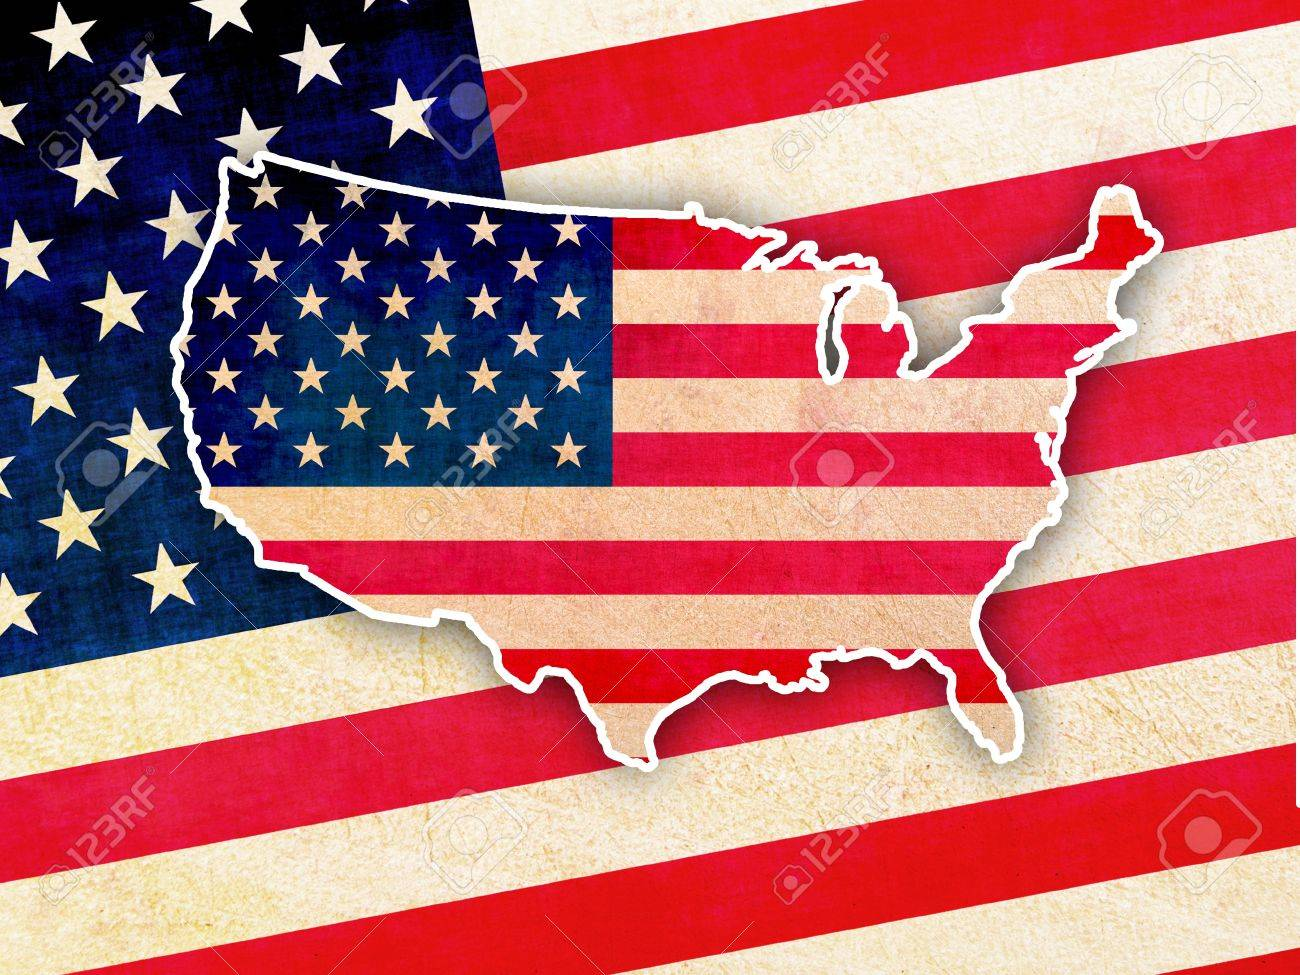 Amérique Quatre Juillet Wallpaper Etats Unis Patriotiques Fond Décran